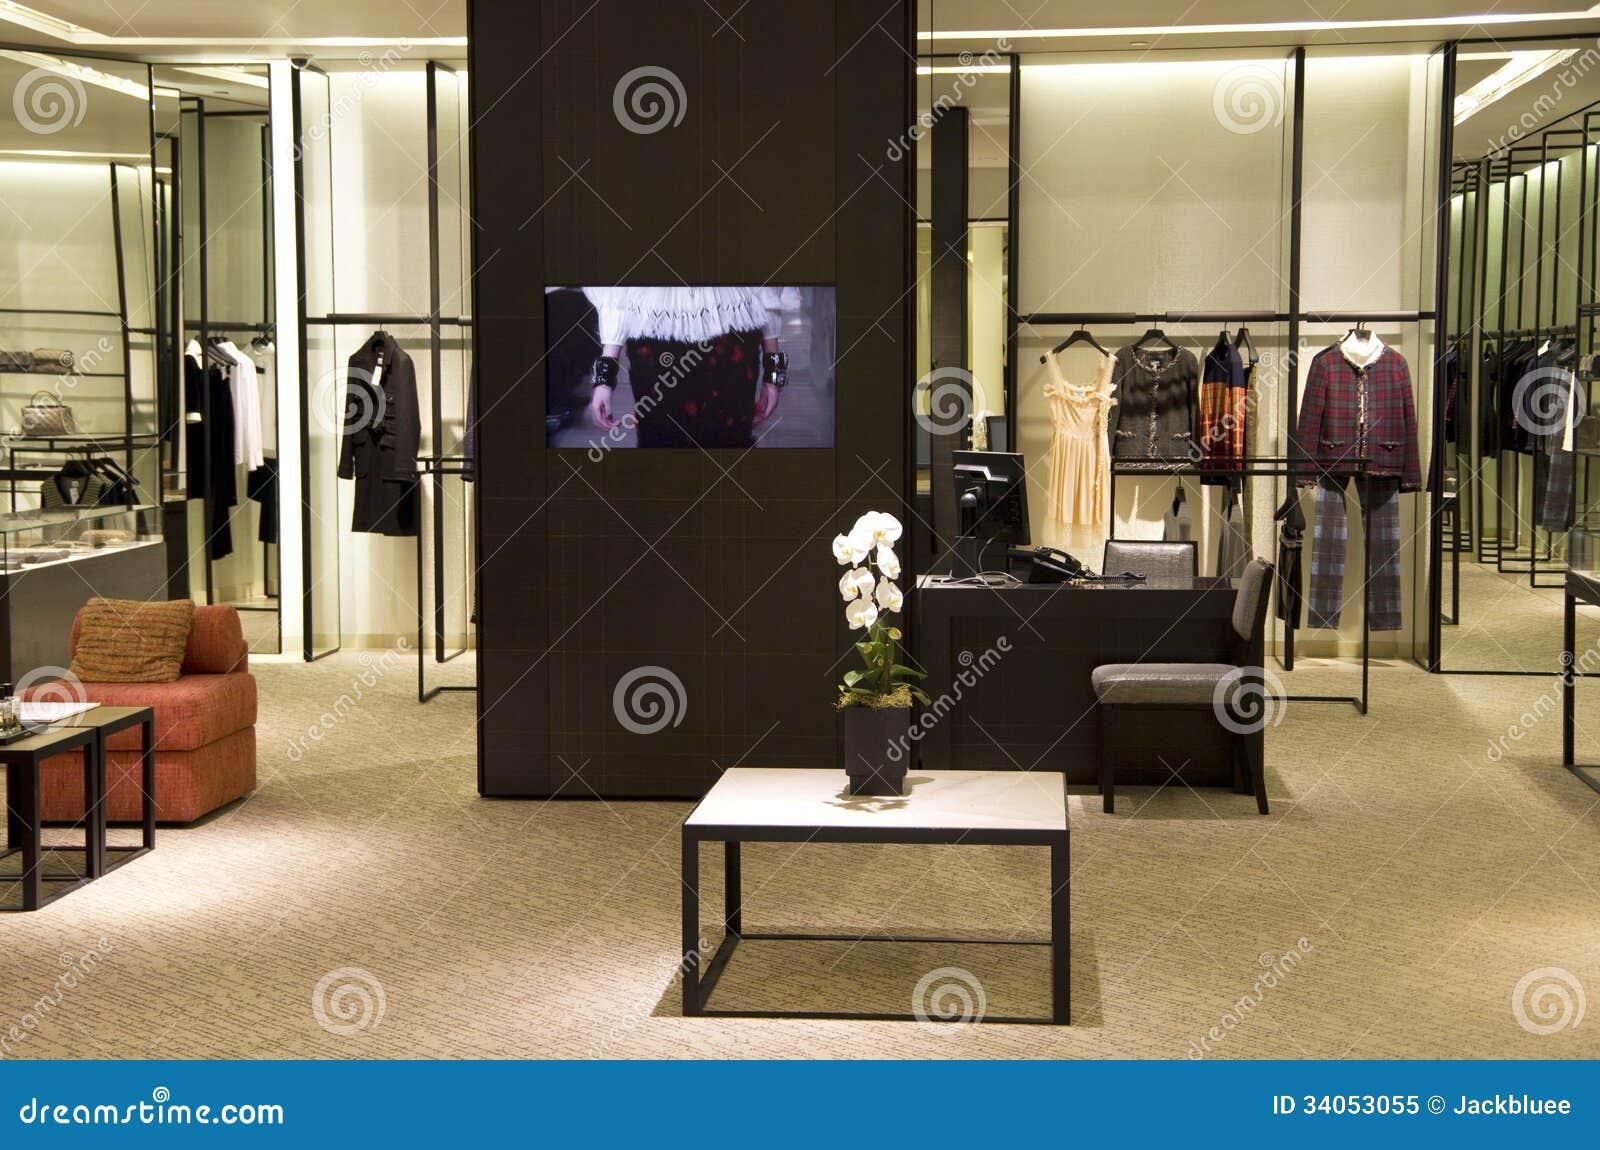 Elegant clothing stores